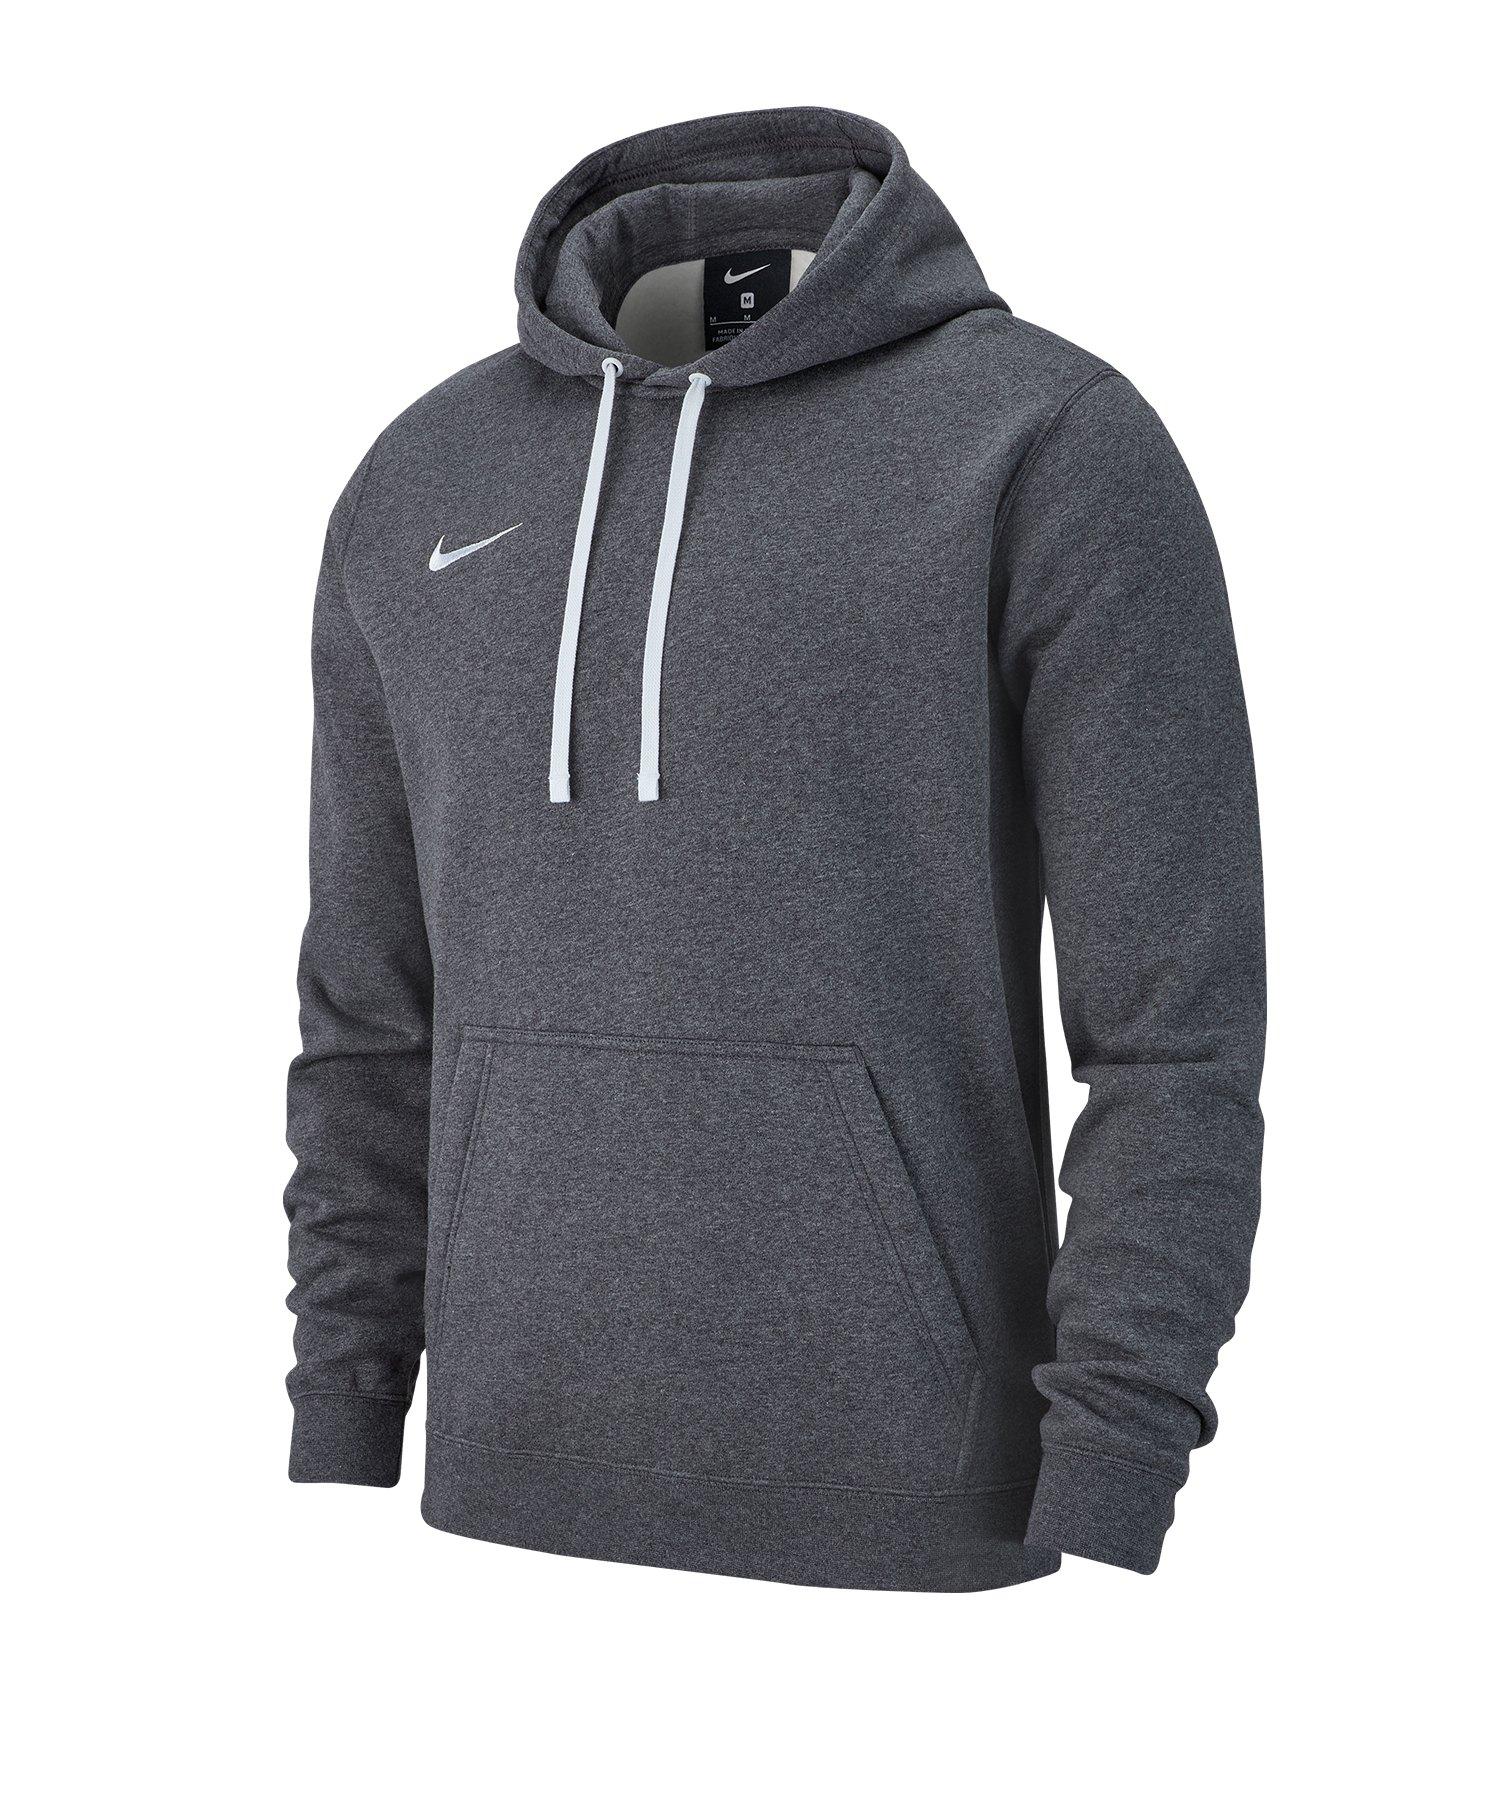 Details about Nike Team Club 19 PO Fleece Hoody Sweatshirt 010 Size: M